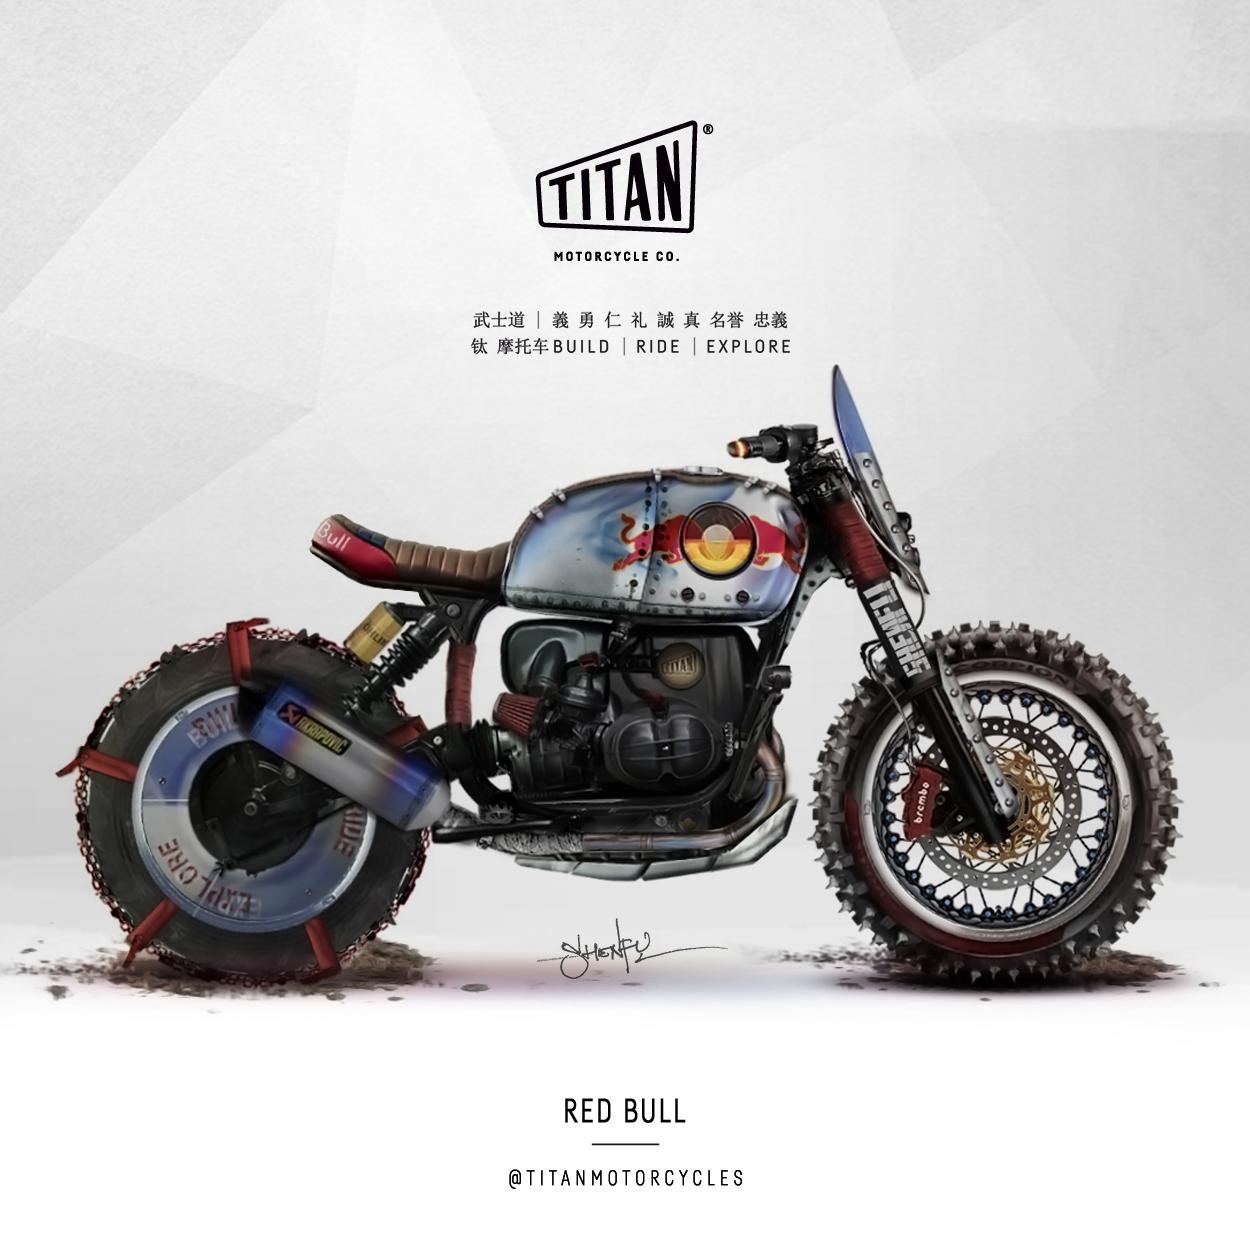 SHENFU Art of Custom Bike TITAN Motorrad Umbau Cafe Racer Graz Mein Motorrad Umbau Preis